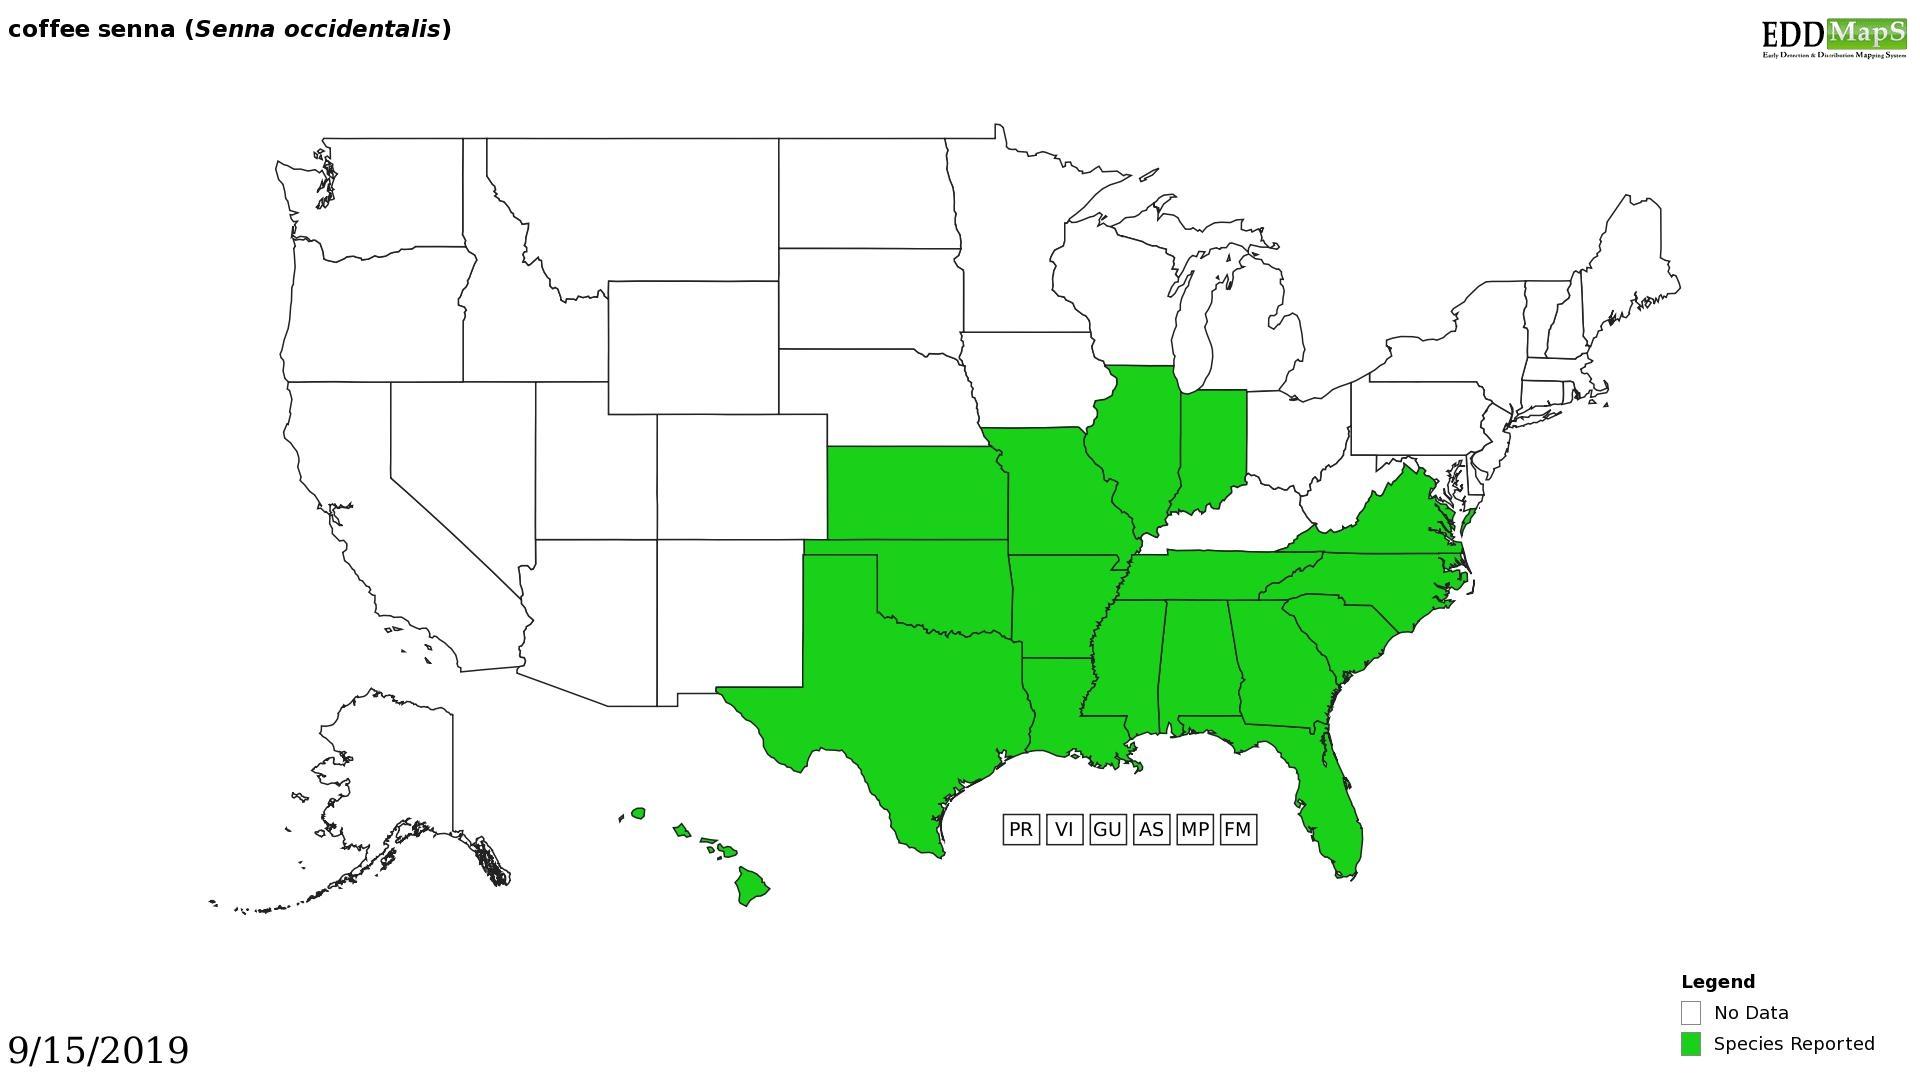 Coffee senna distribution - United States